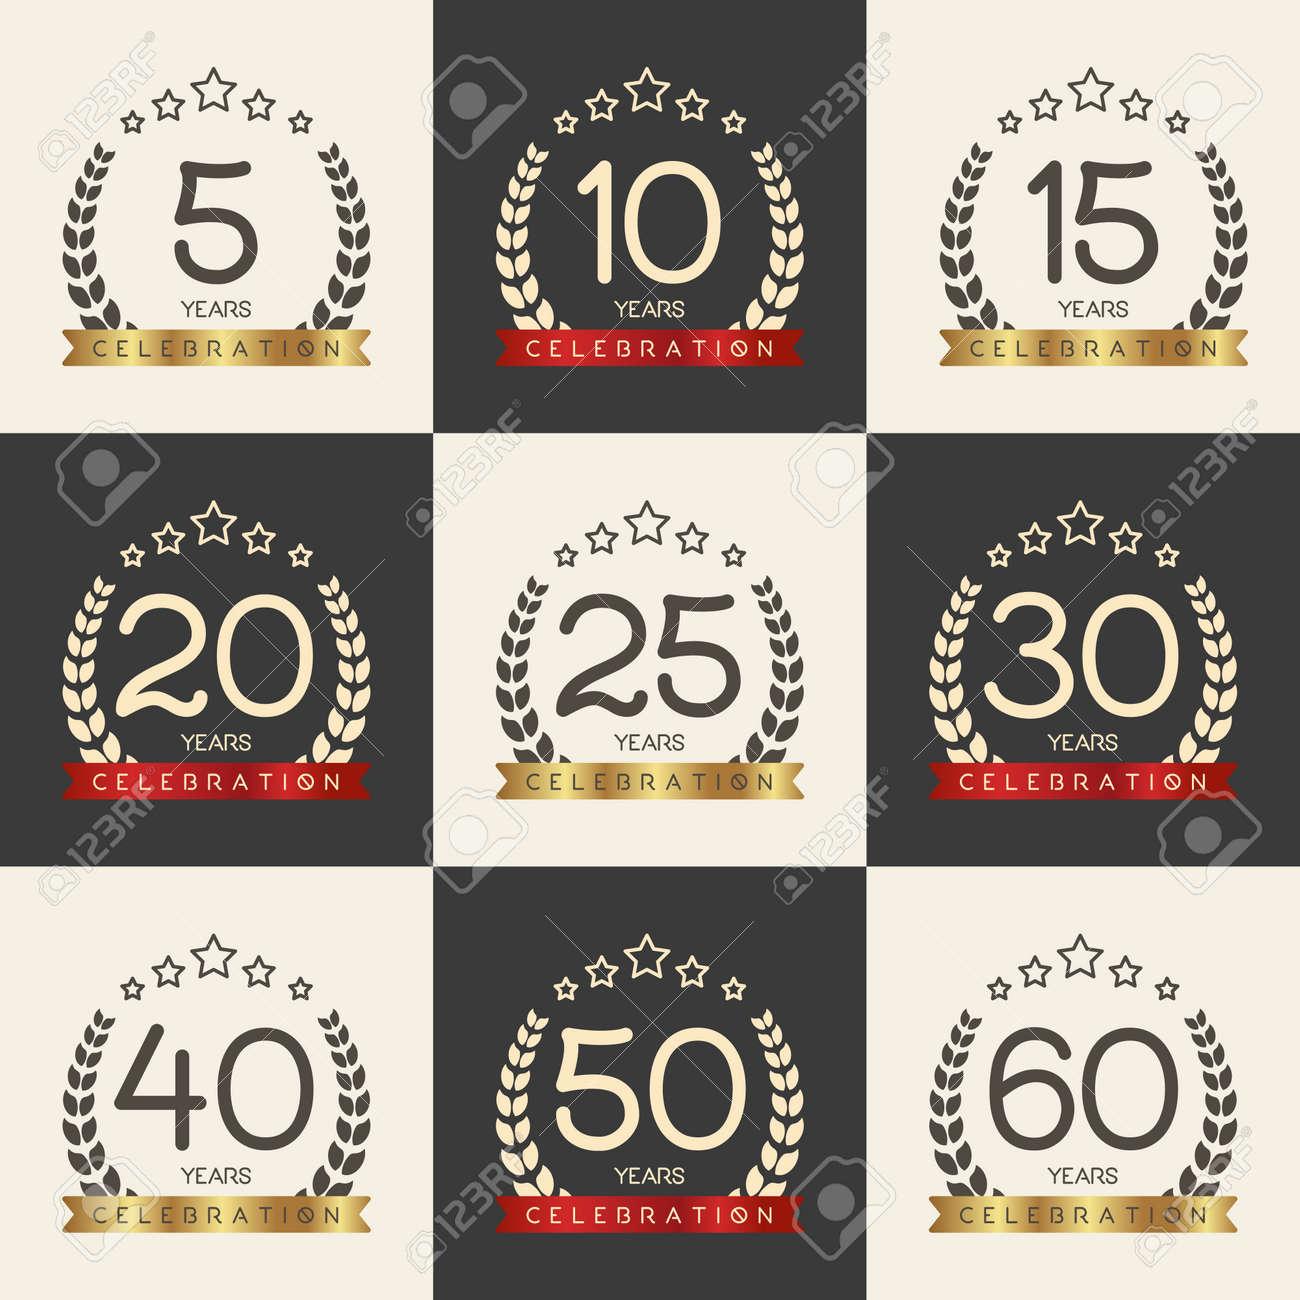 Vector Set Of Anniversary Symbols 5th 10th 15th 20th 25th